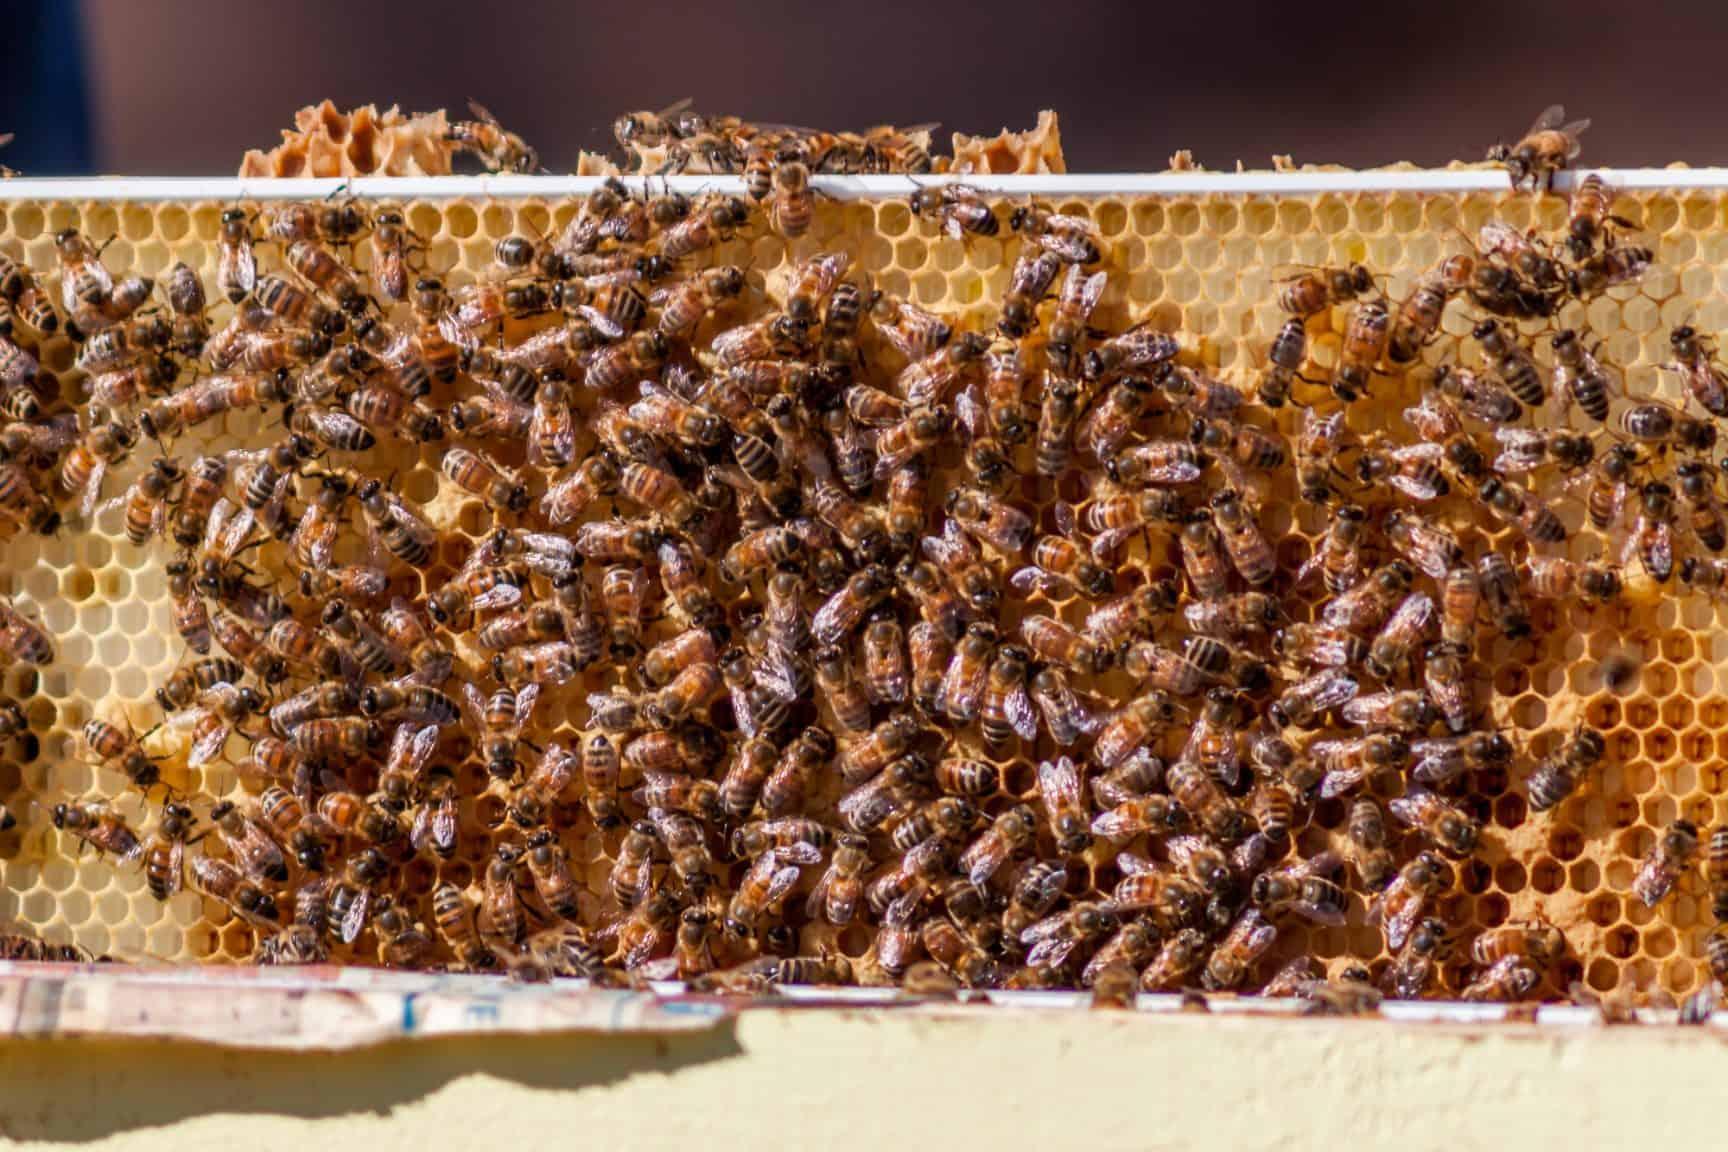 Managing Hive Capacity - PerfectBee